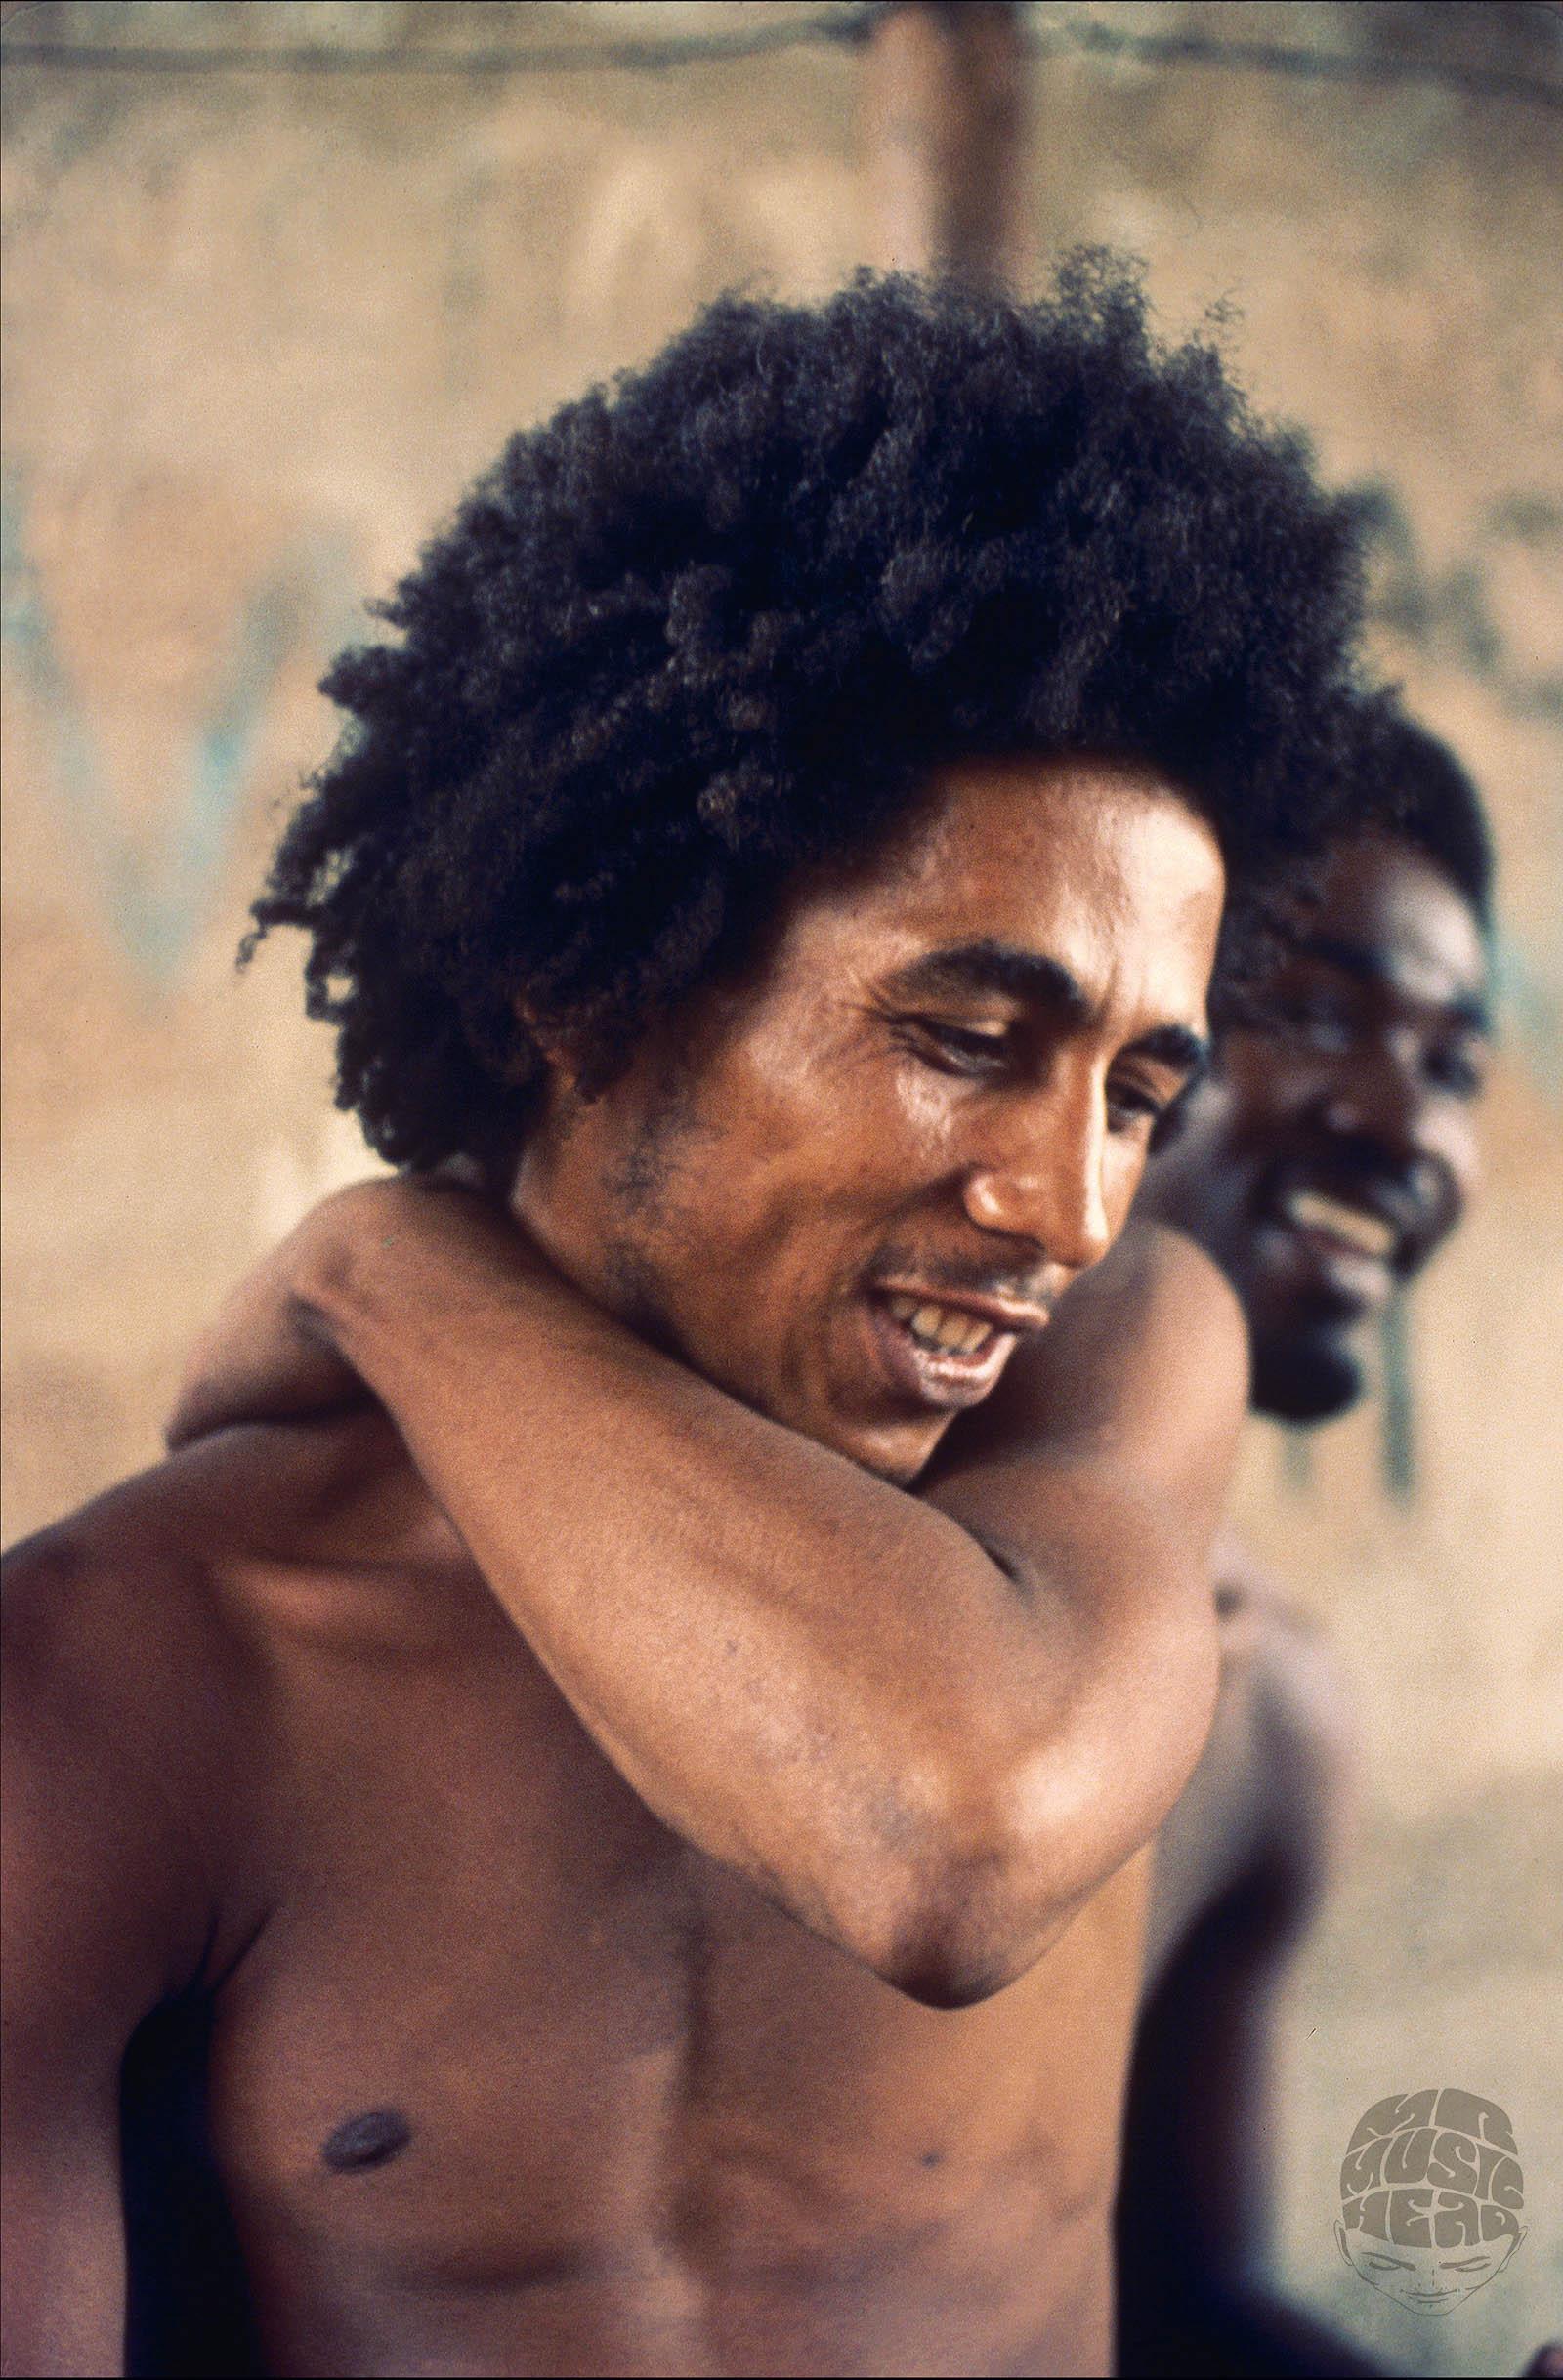 arthur gorson_Bob Marley 1973.jpg